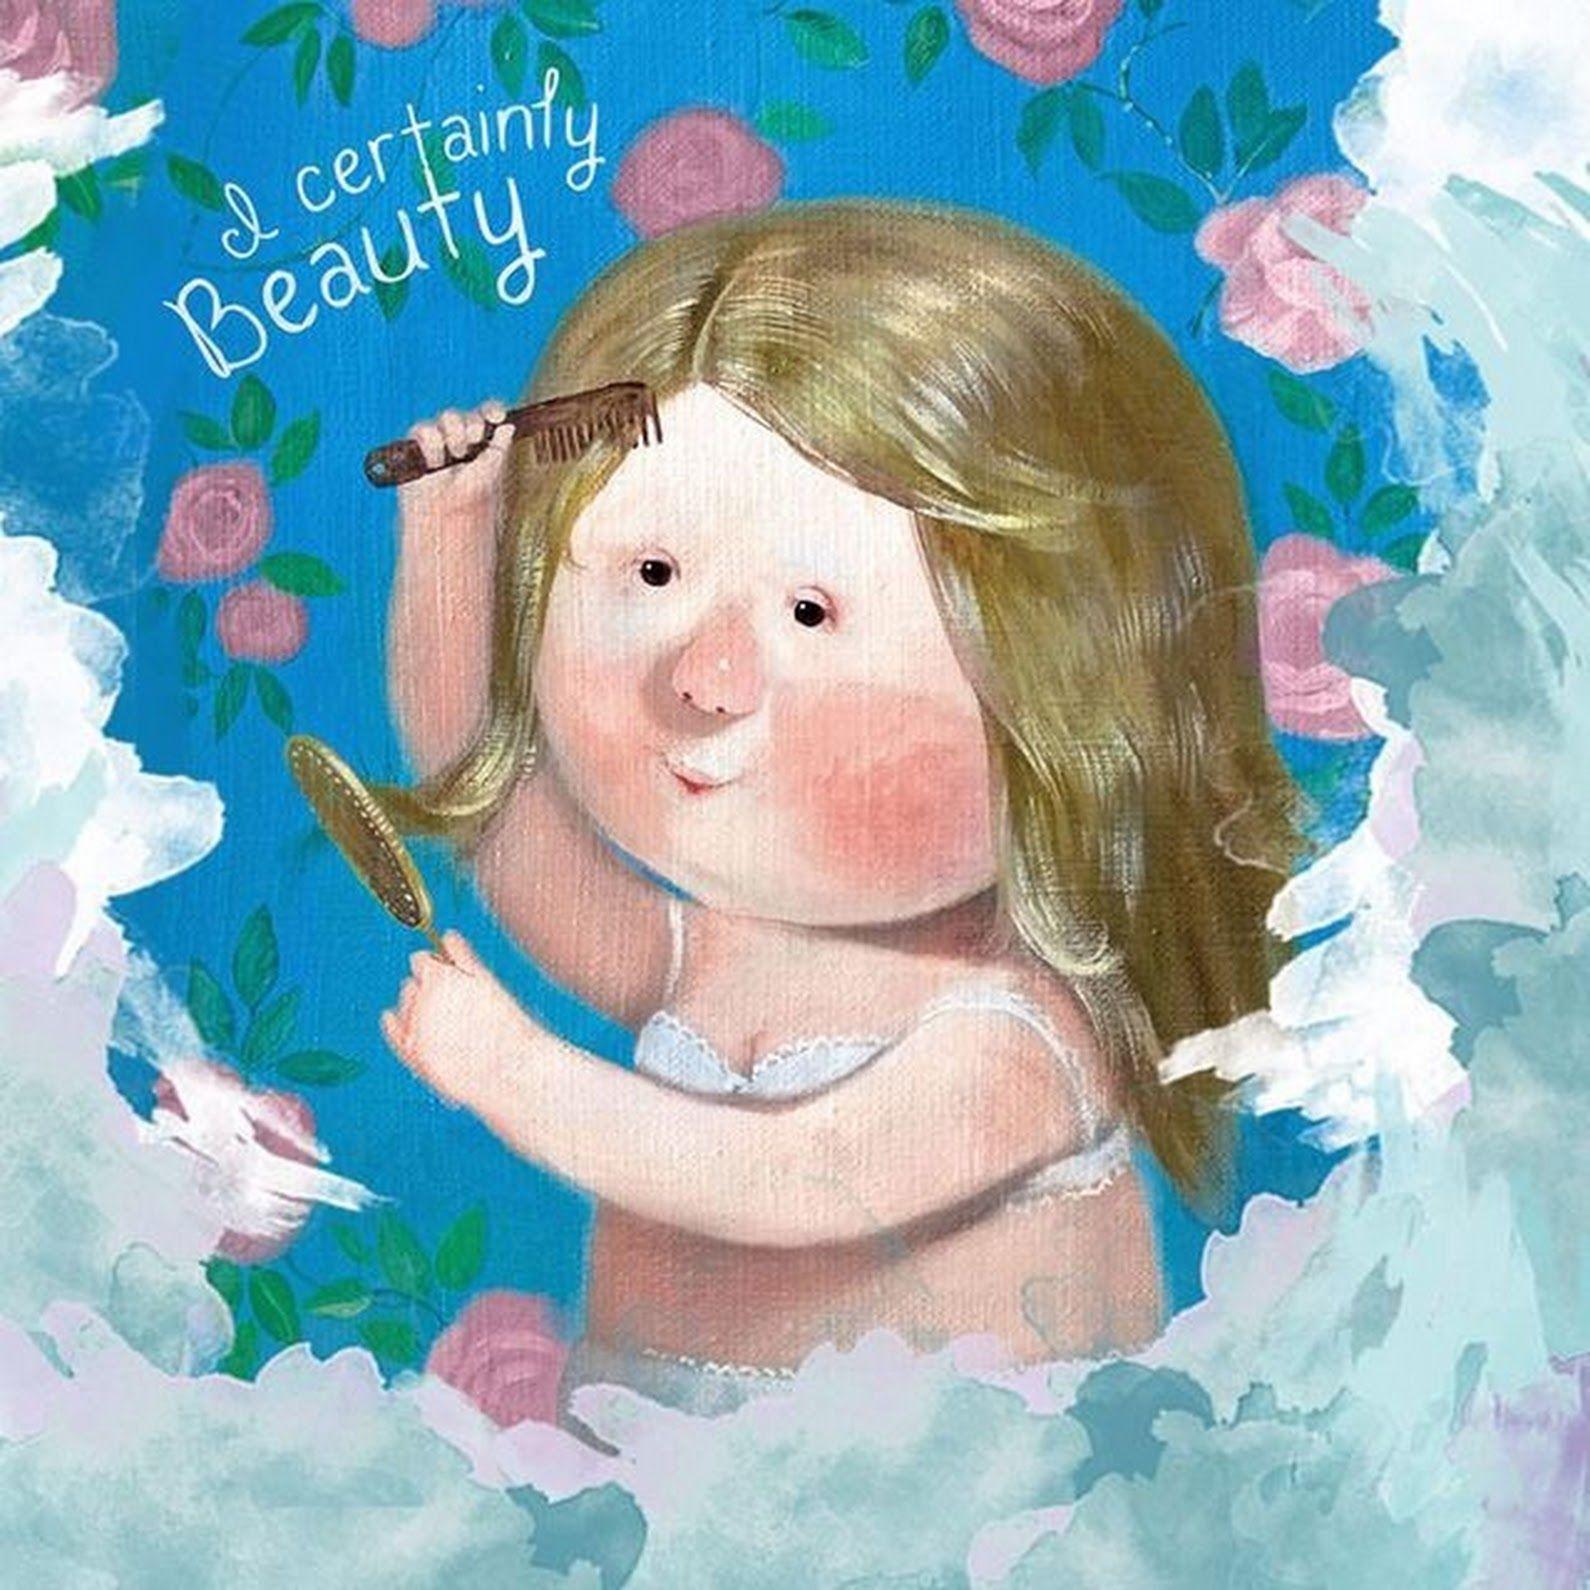 ангелы гапчинской картинки натюрморт картины маслом